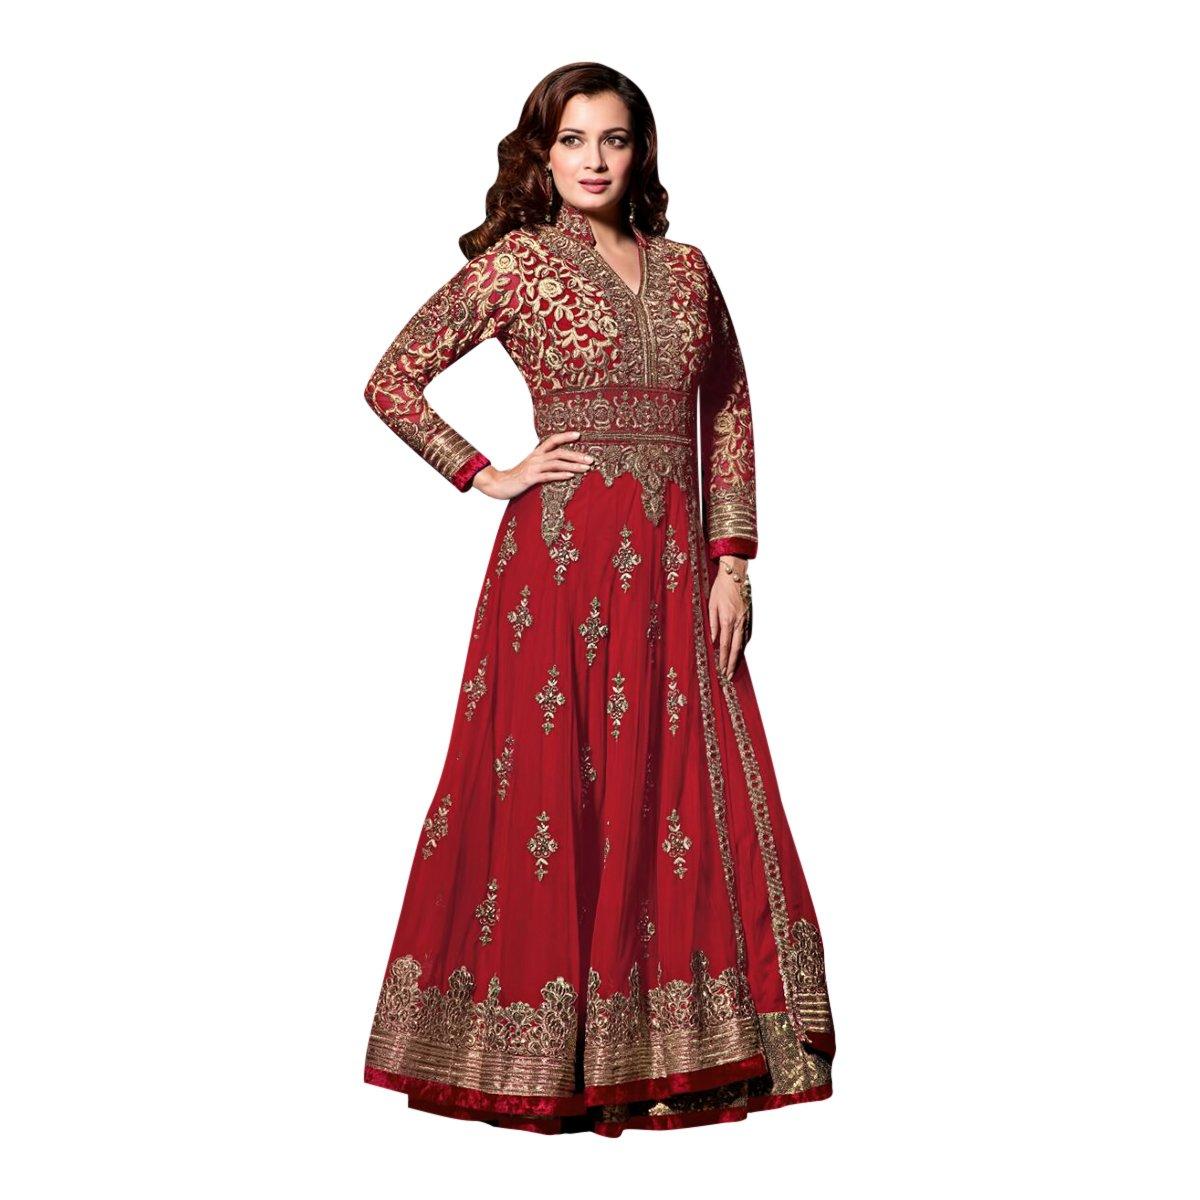 Black Friday Sale velvet Wedding Wear Salwar Suit Lehenga Dress Kaftan Women MuslimEthnic Traditional 623 (Red)